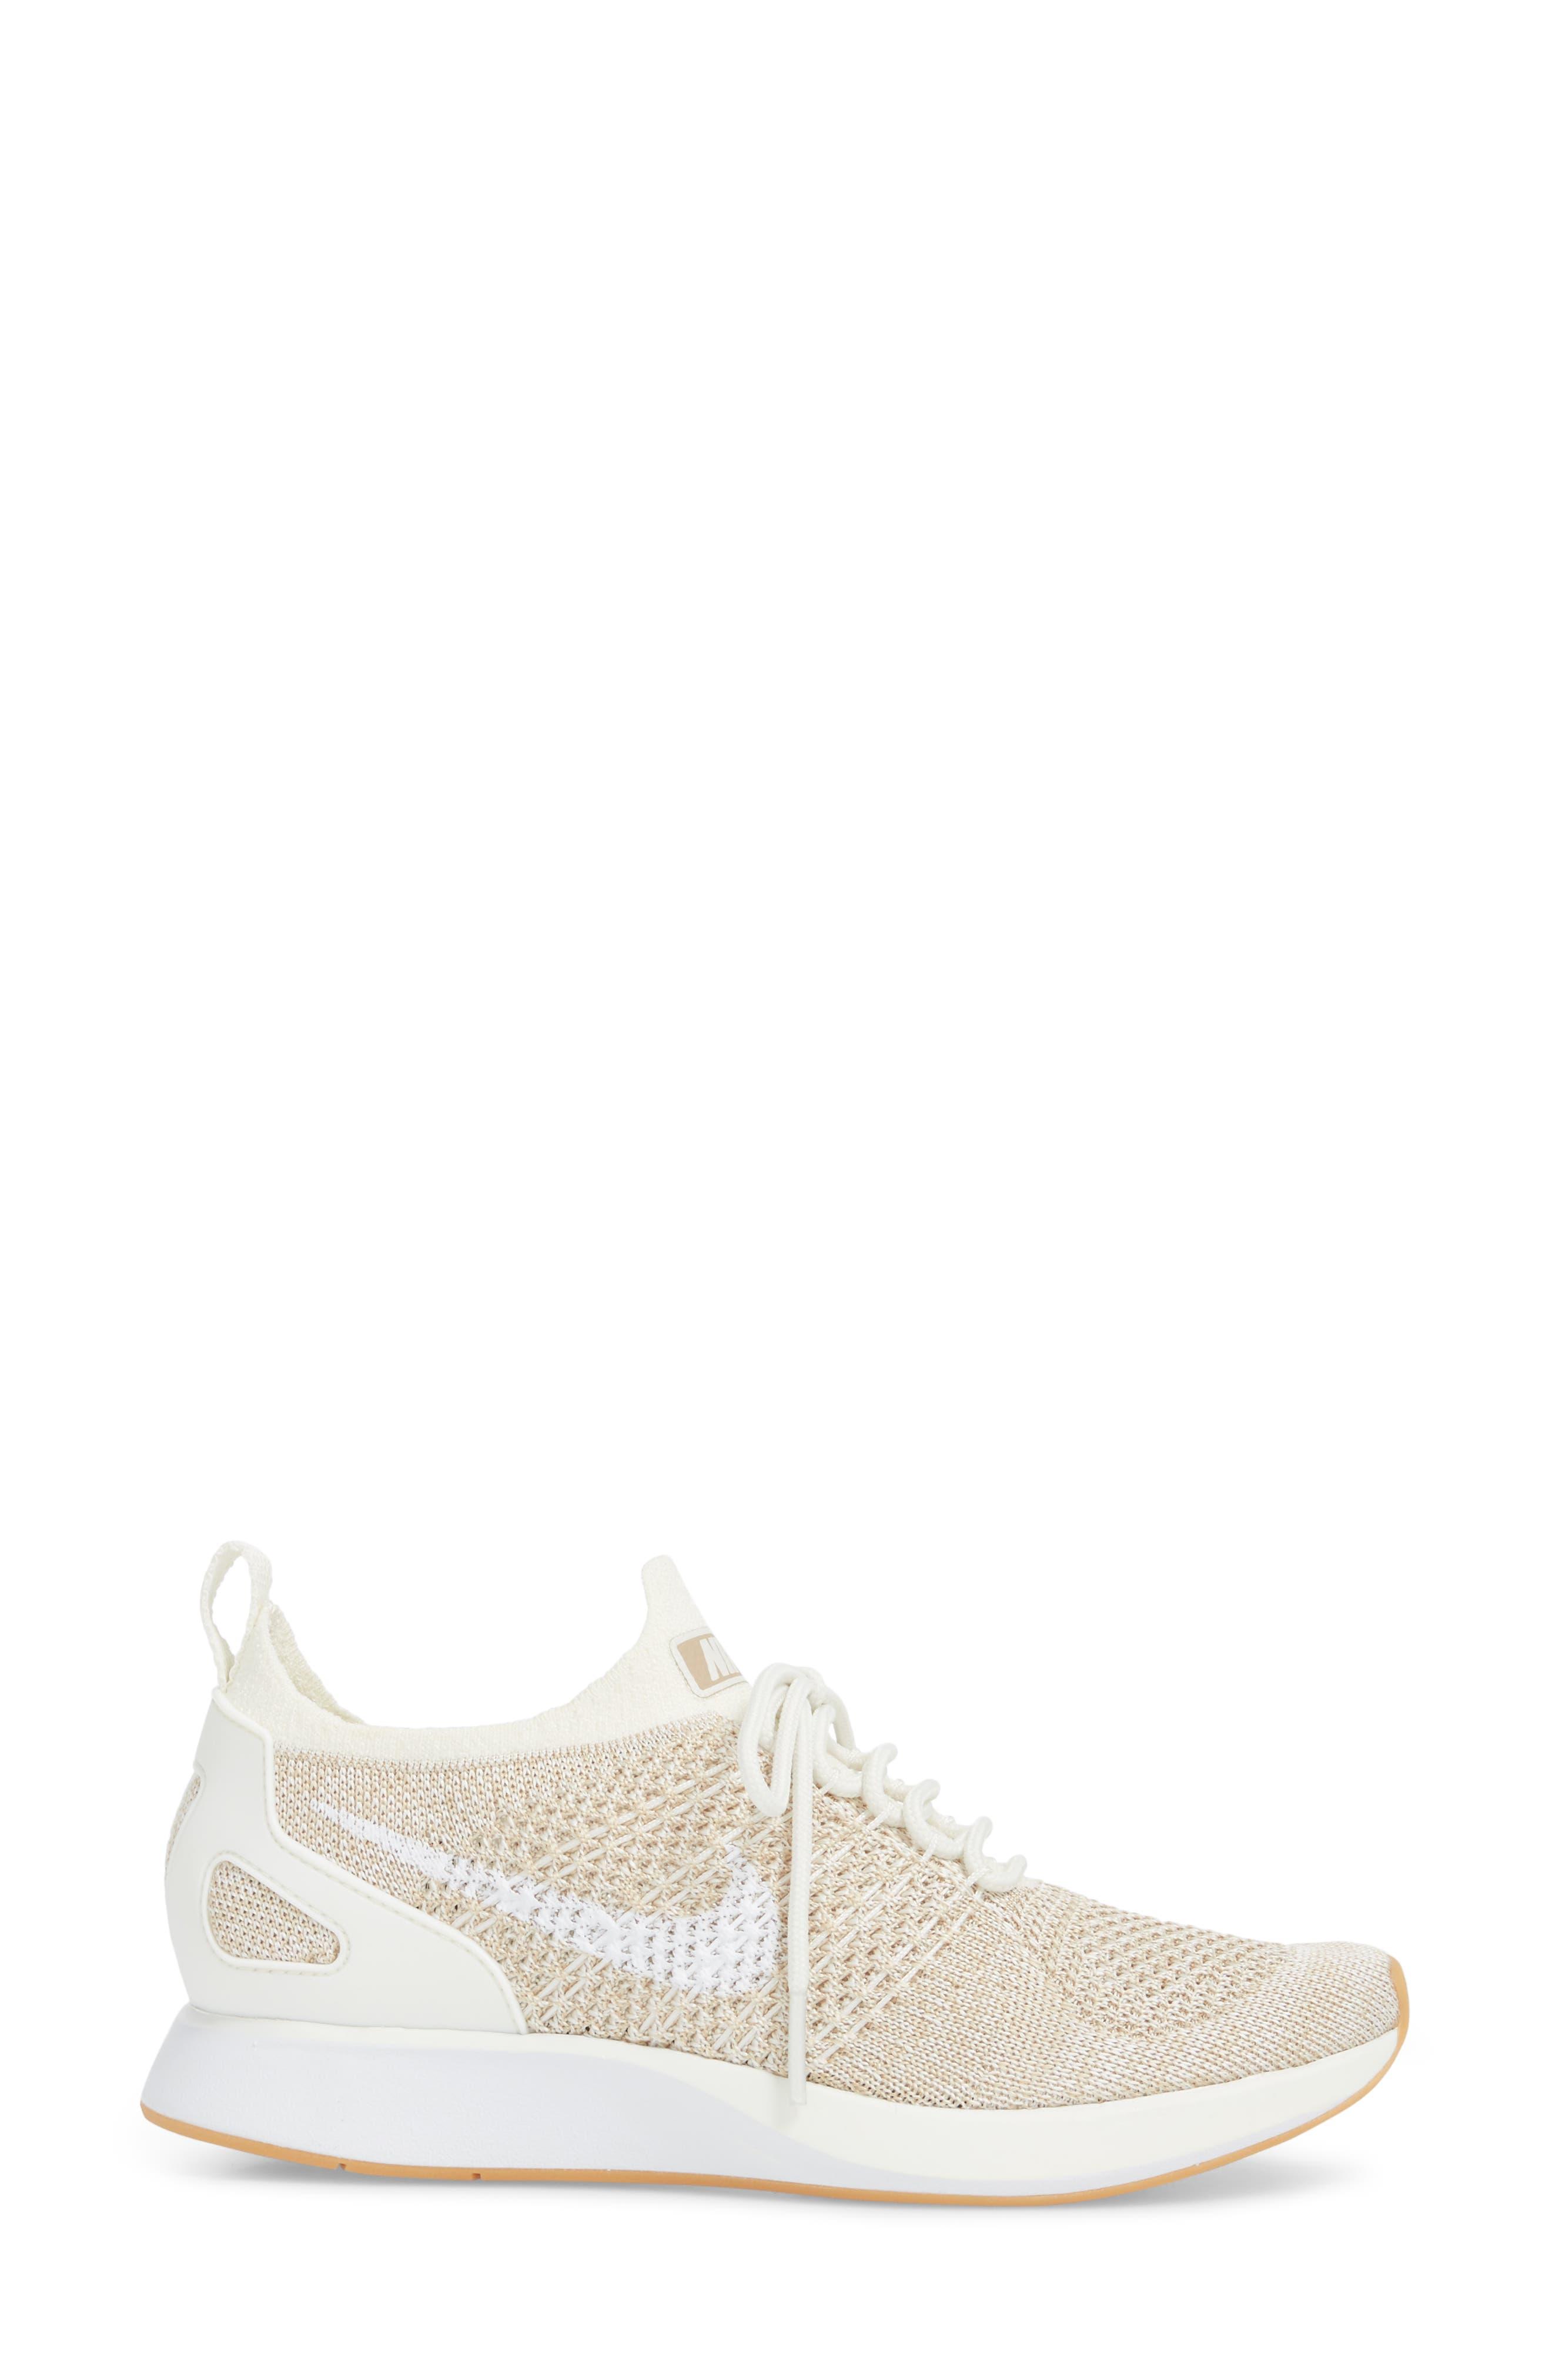 Air Zoom Mariah Flyknit Racer Sneaker,                             Alternate thumbnail 3, color,                             Sail/ White/ Sand